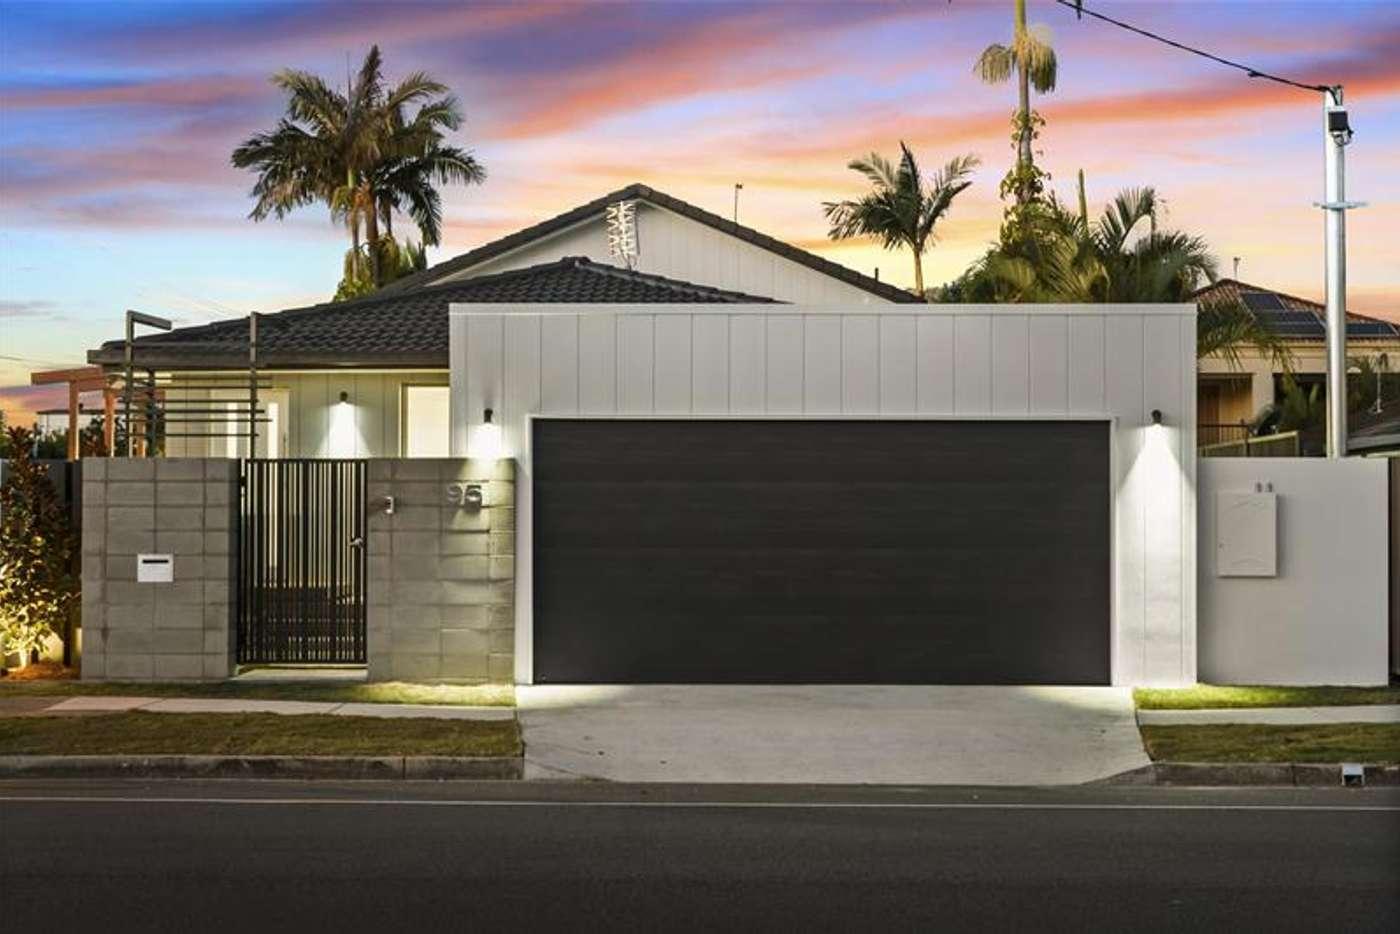 Main view of Homely semiDetached listing, 95 Tahiti Avenue, Palm Beach QLD 4221